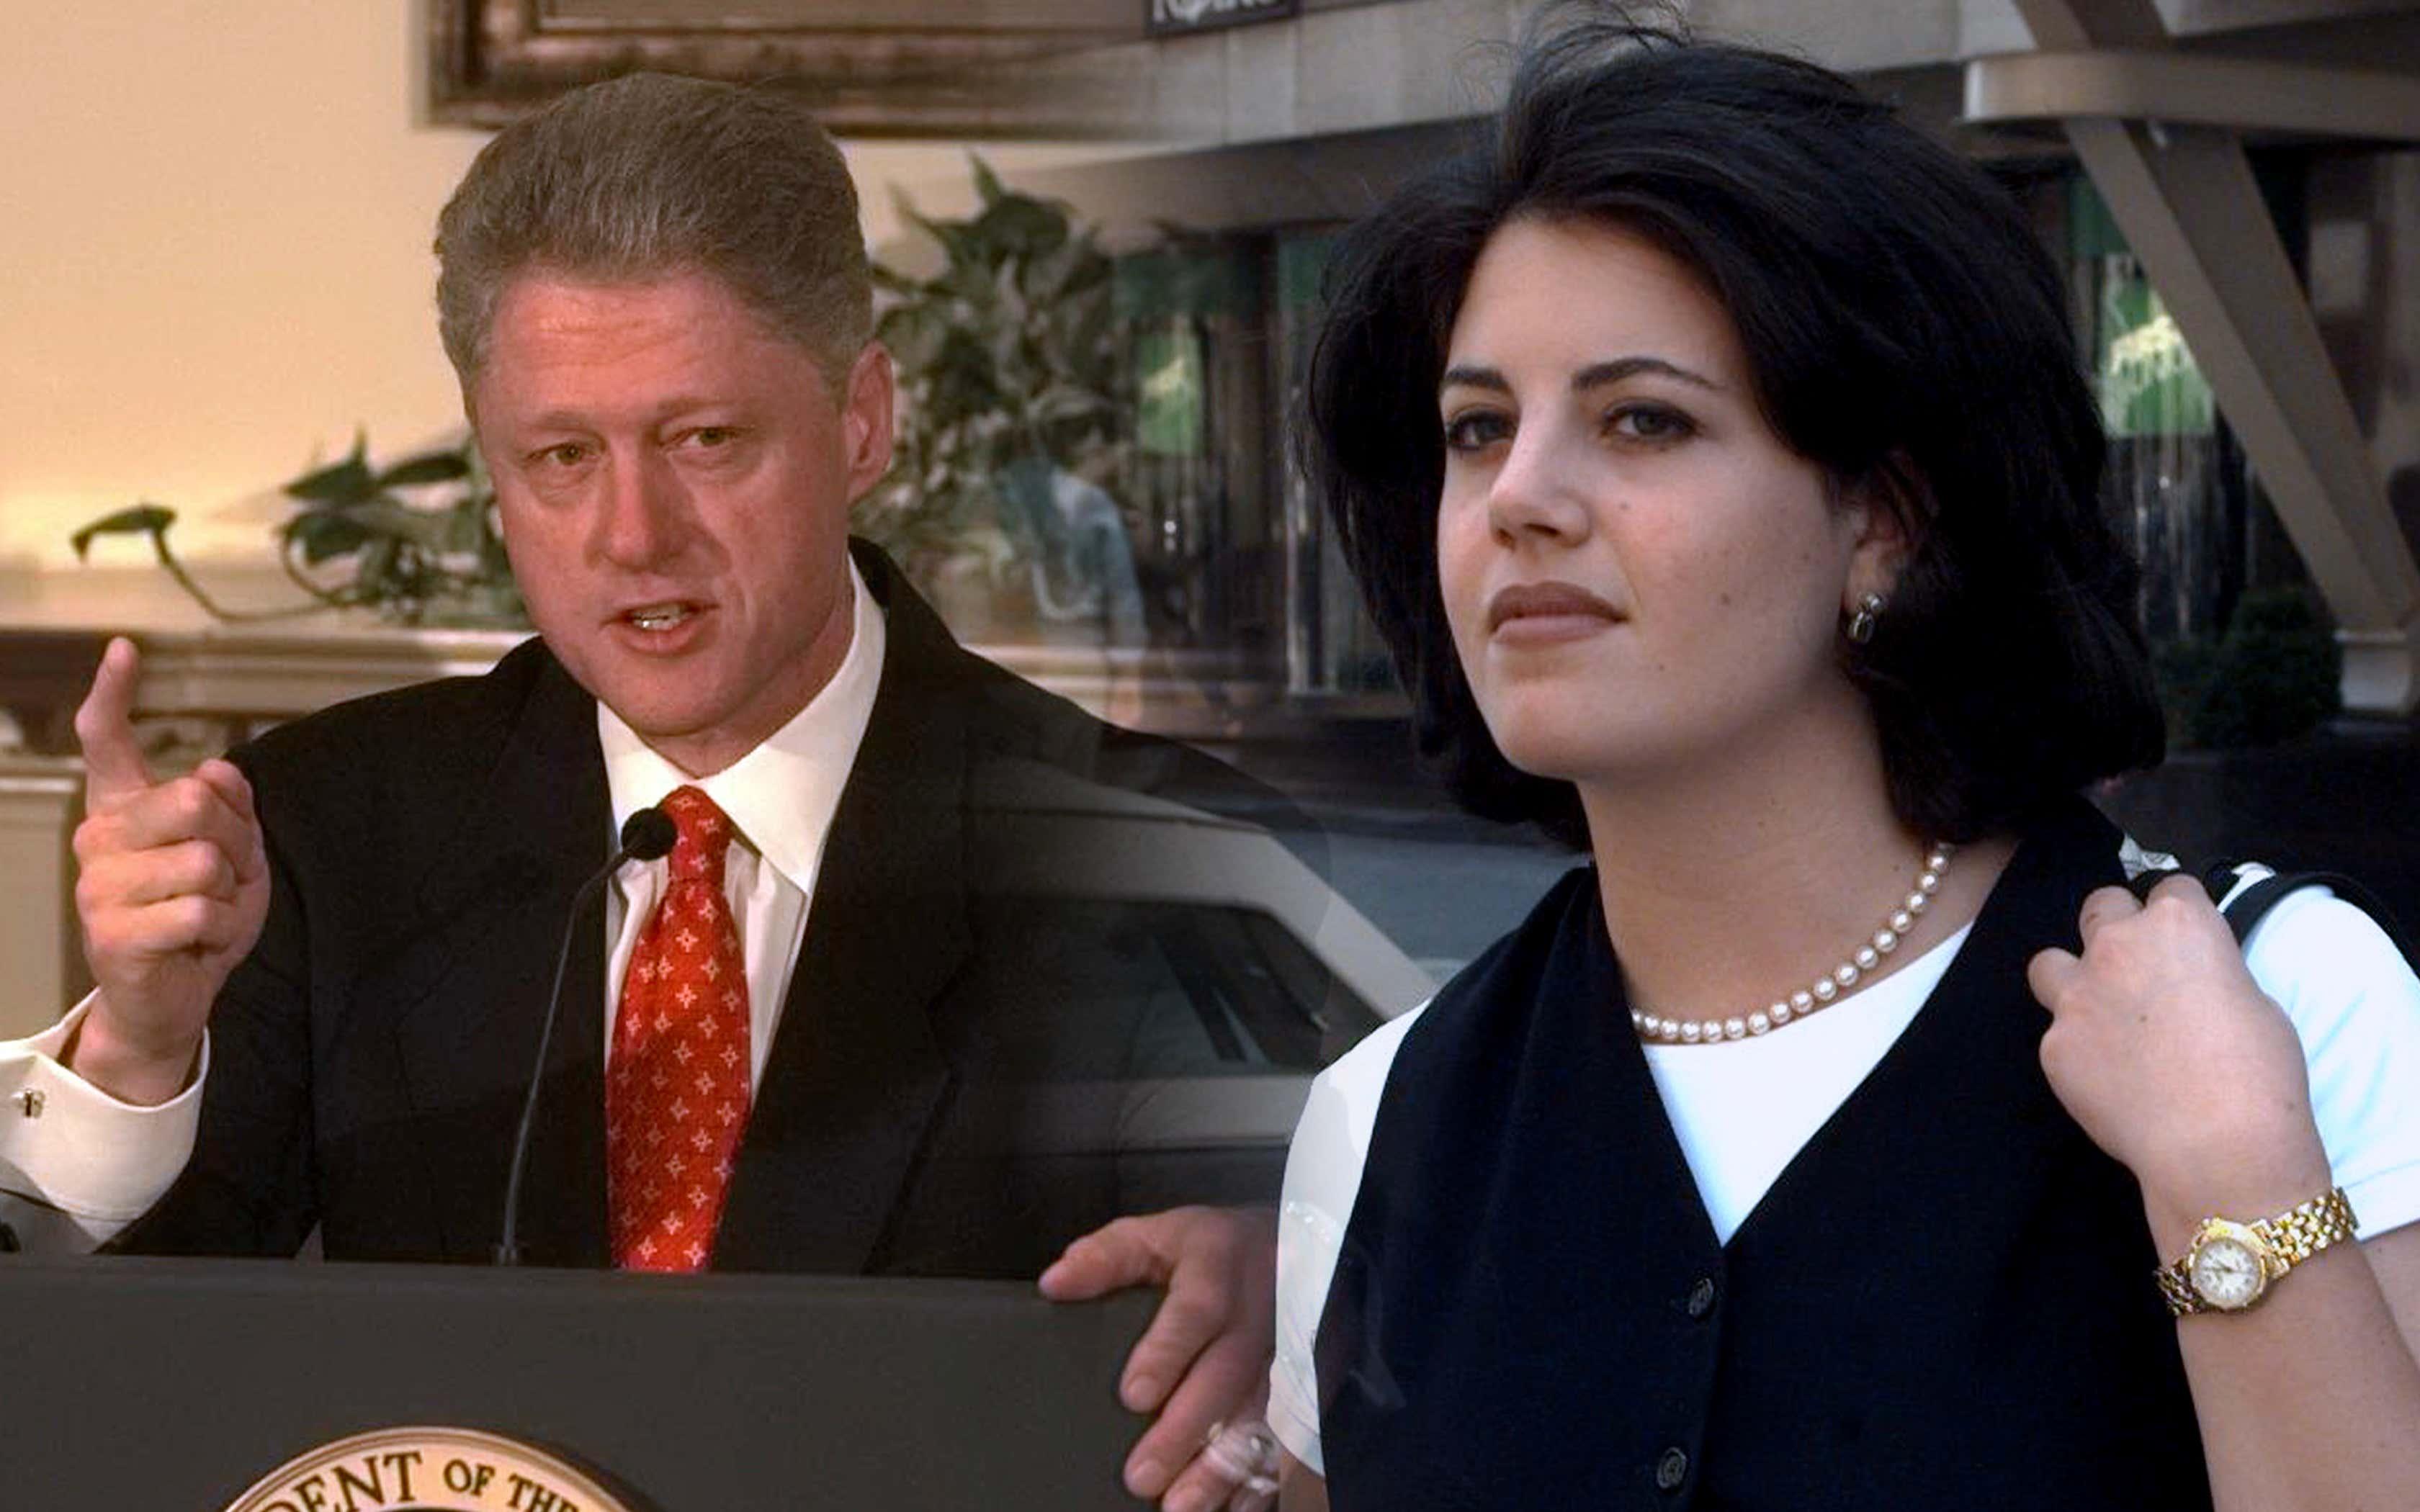 Bill Clinton blowjob